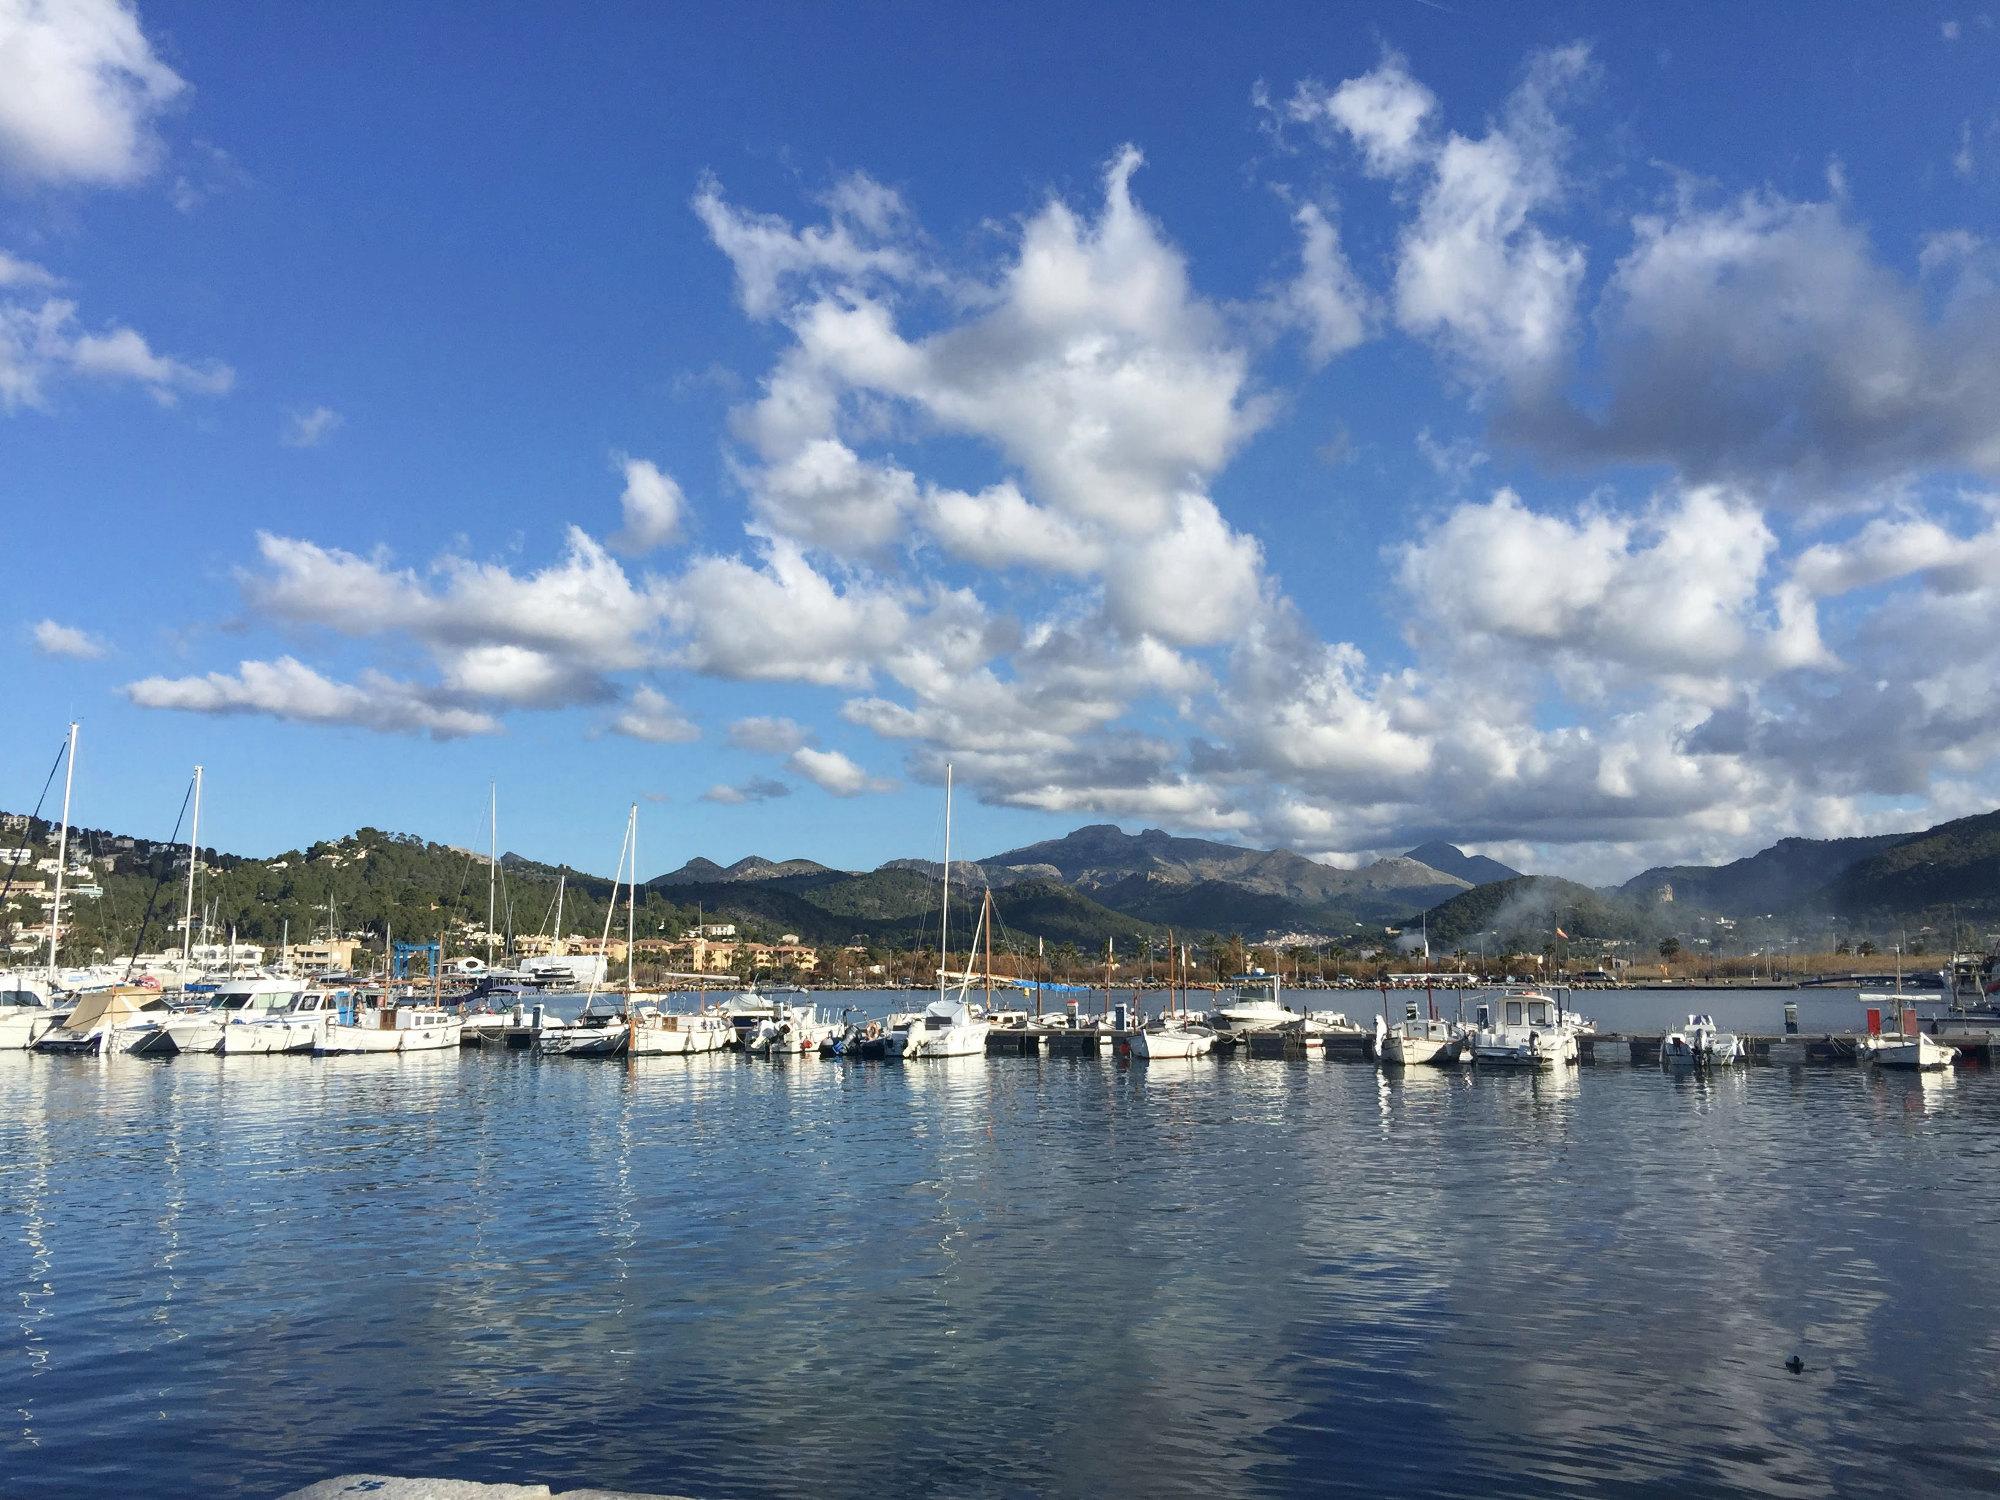 Port d'Antrax